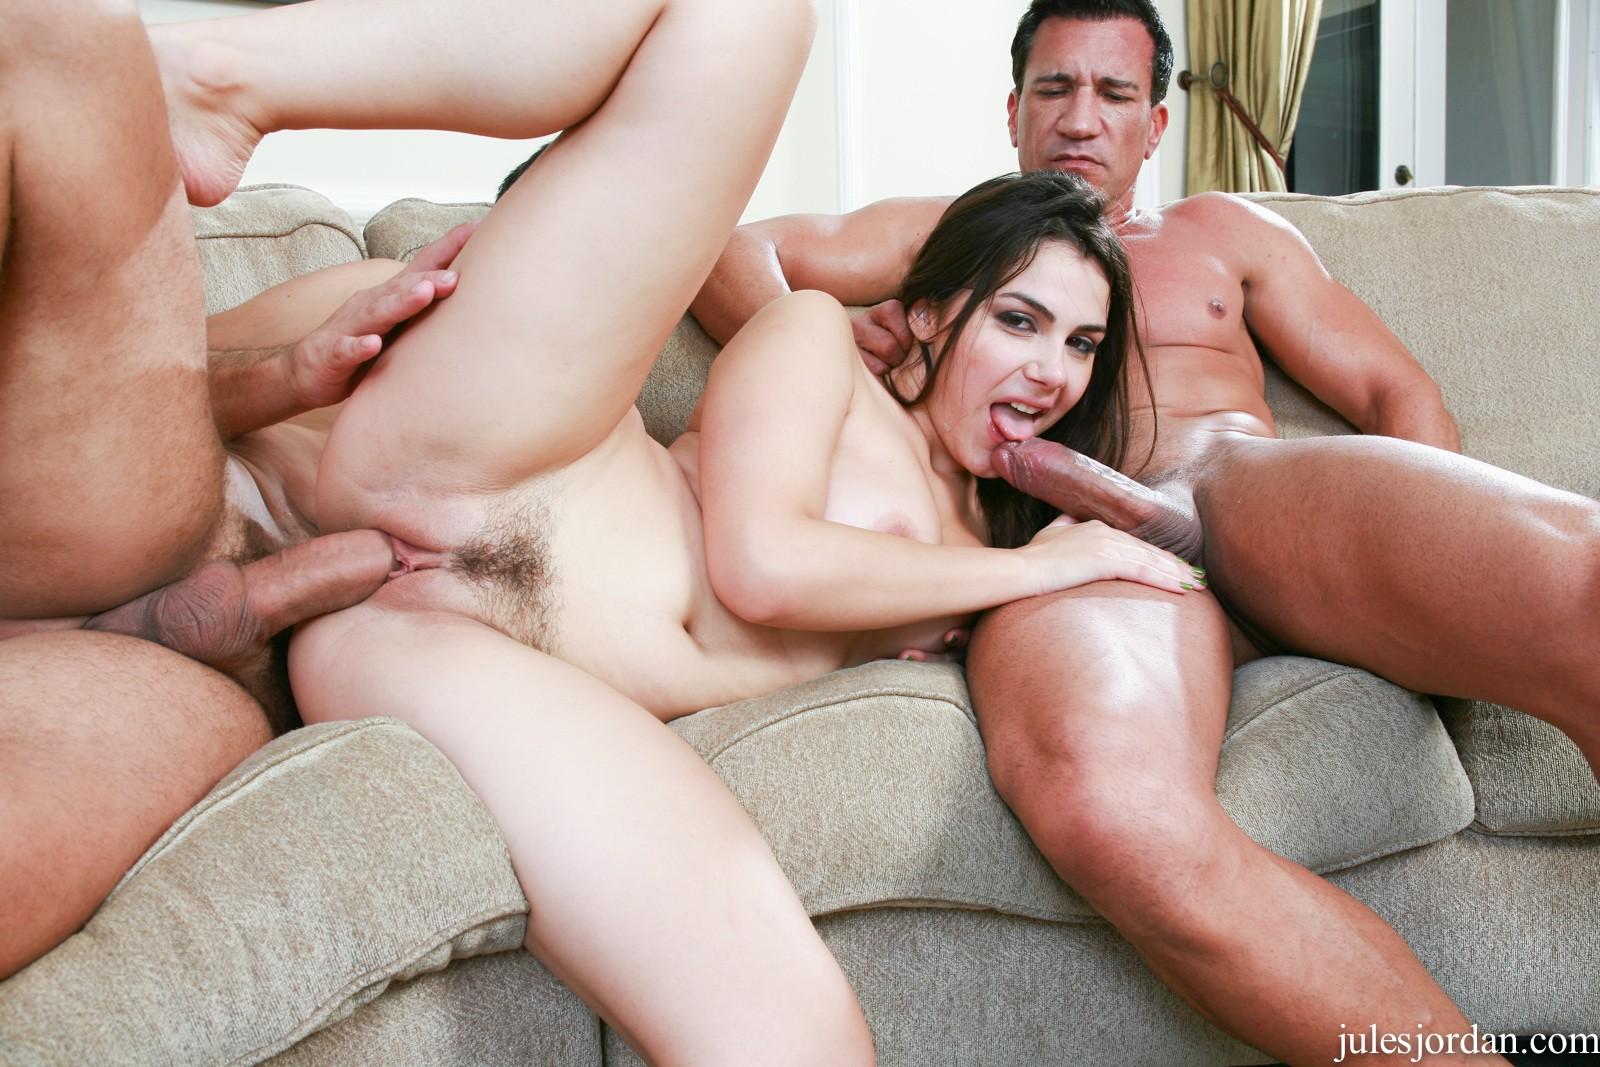 italian-babe-sex-pics